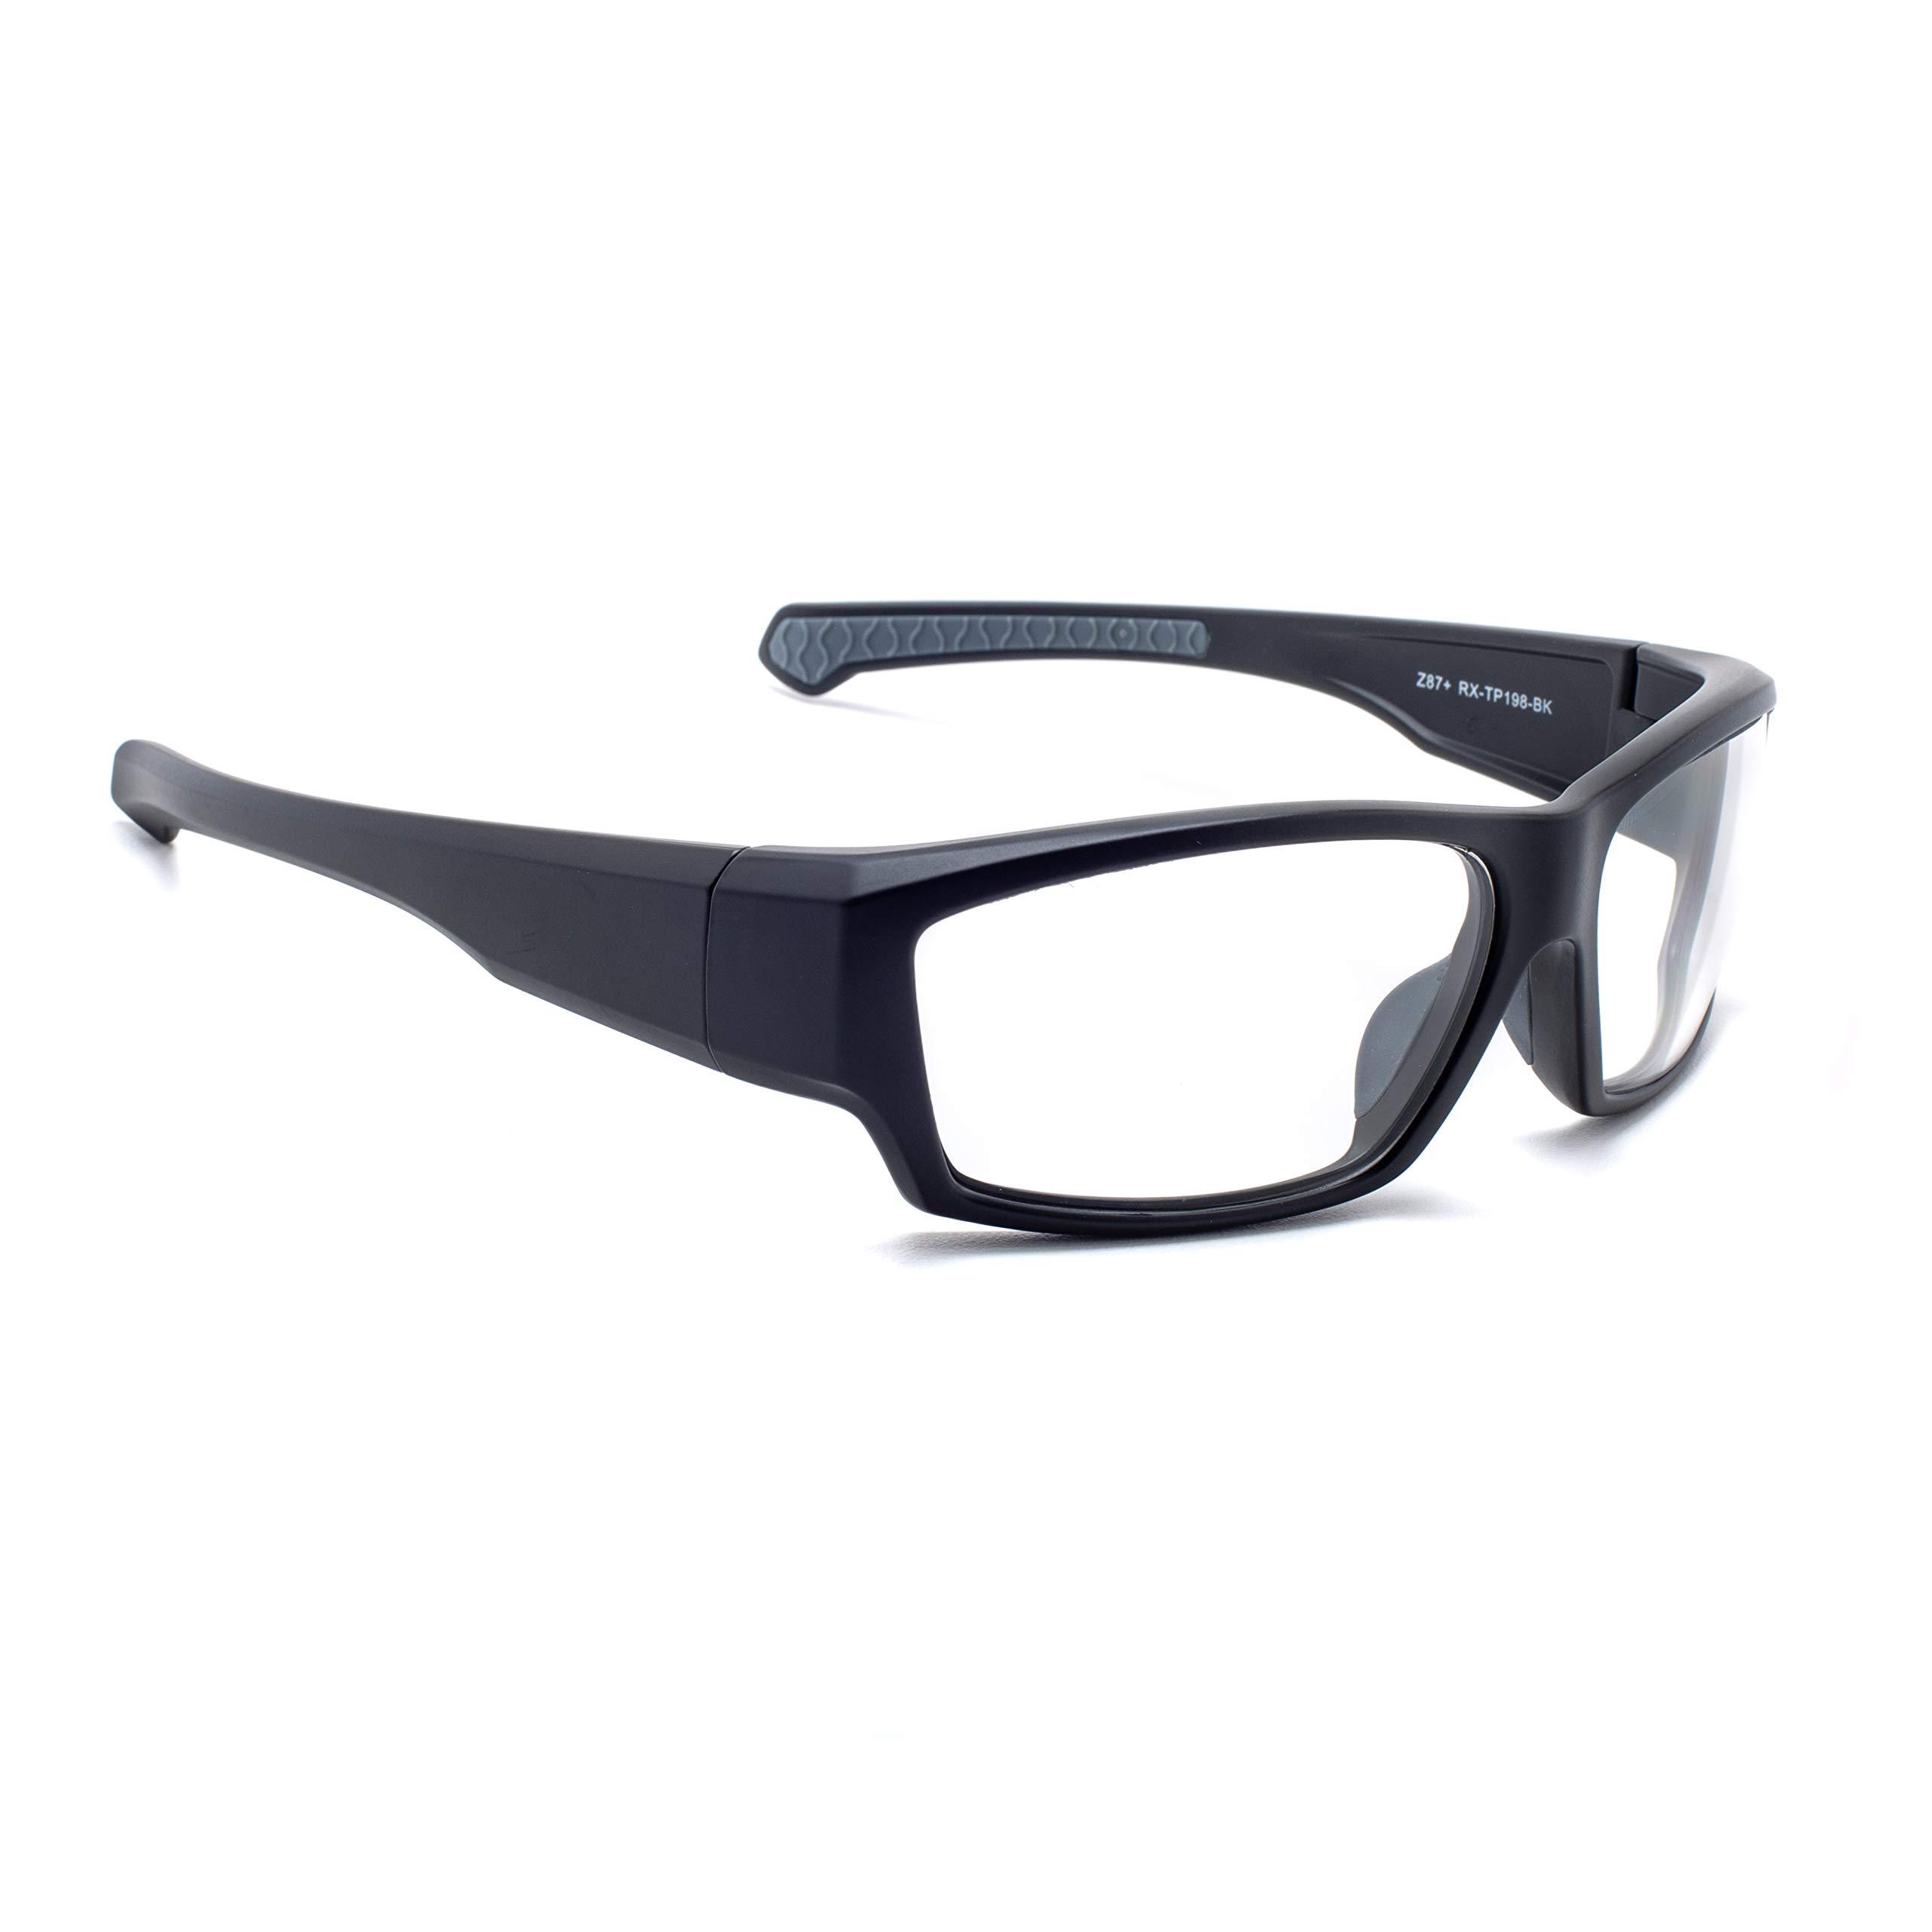 Leaded Glasses Radiation Protective Eyewear RG-TP198-BK